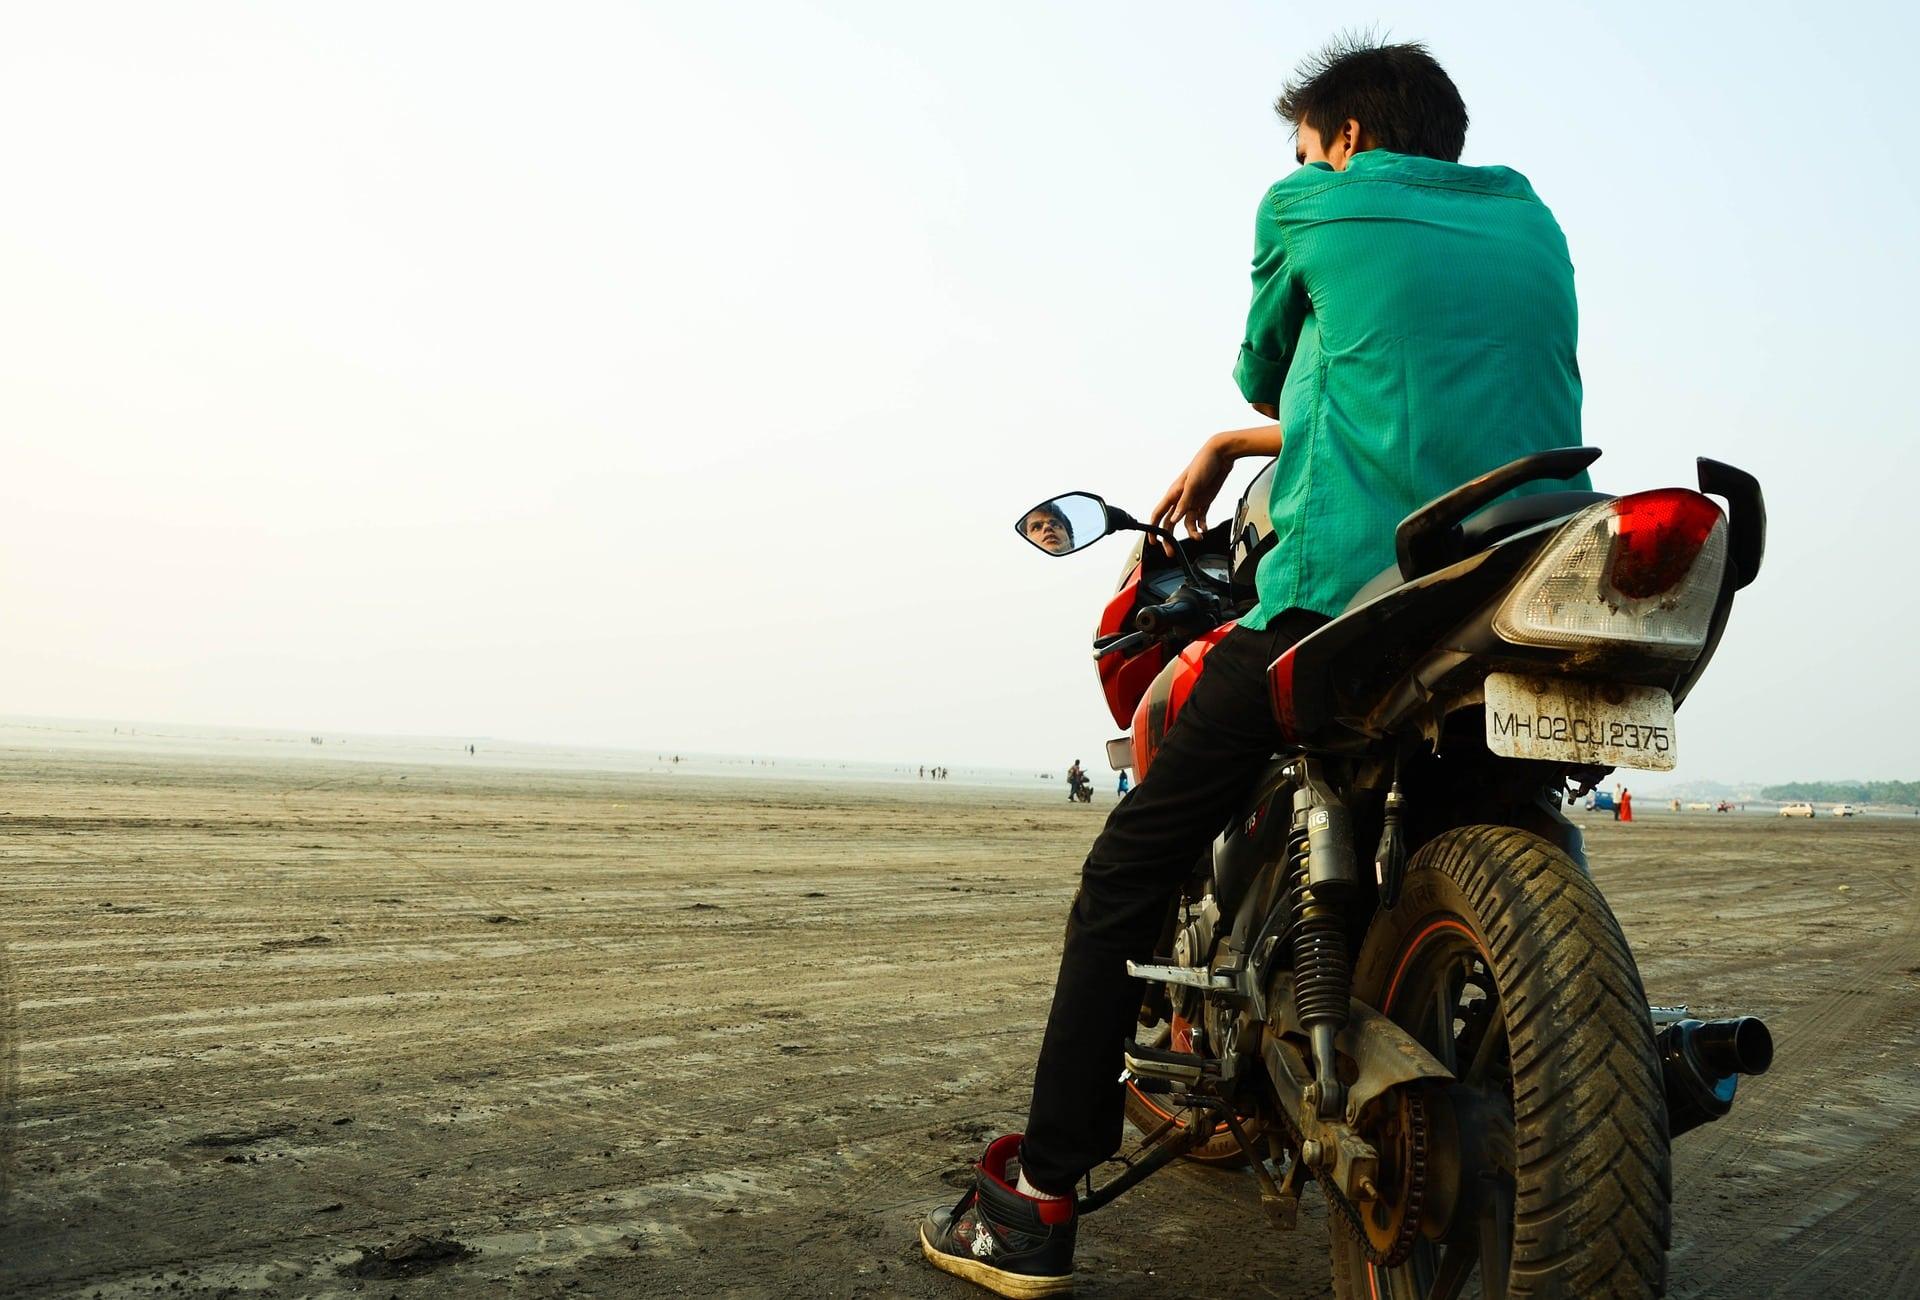 bikes-1494567_1920.jpg